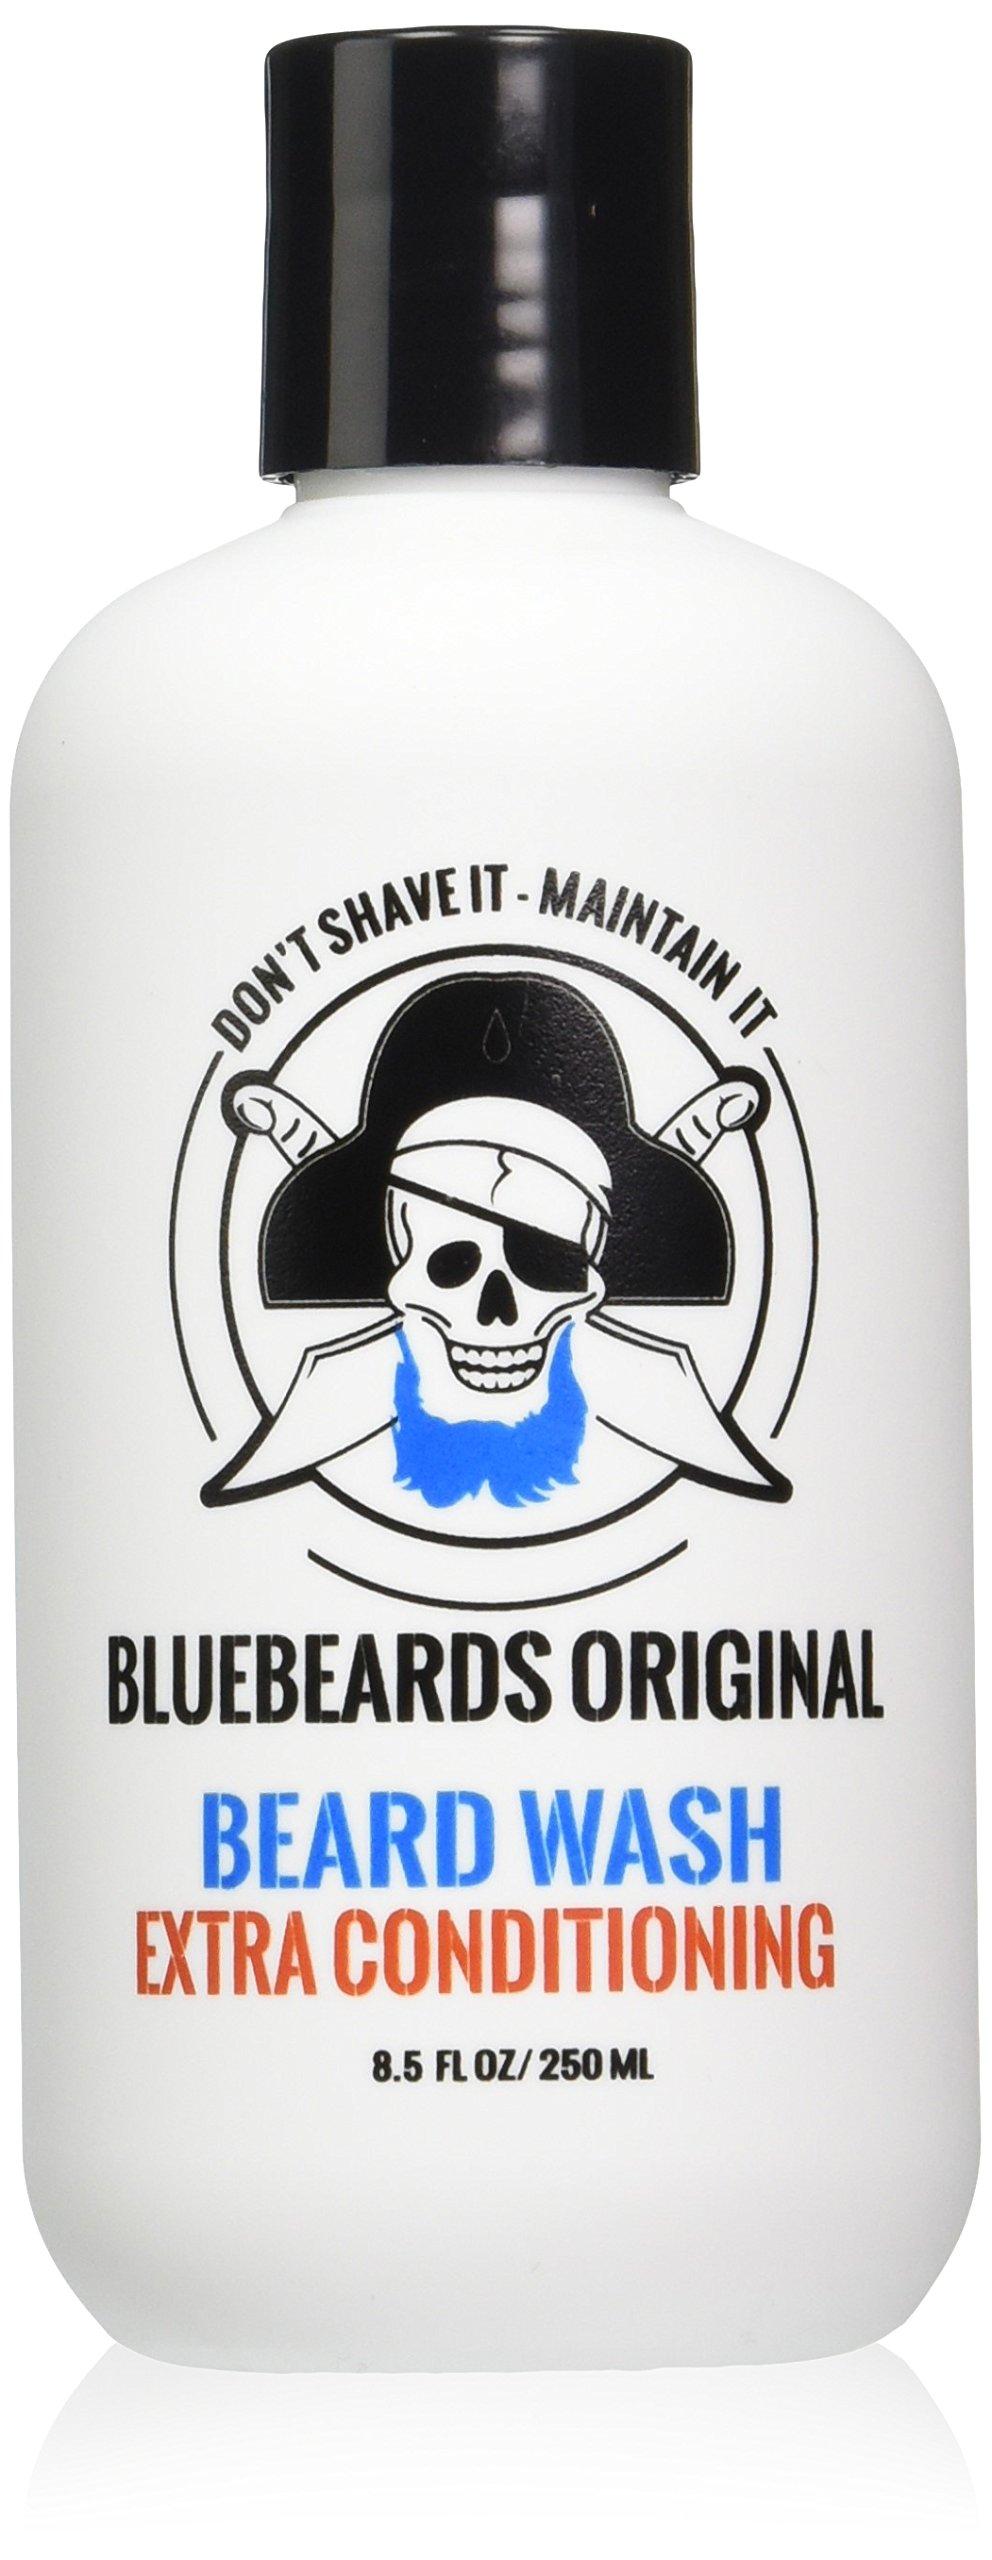 Bluebeards Original Beard Wash with Extra Conditioning, 8.5 oz